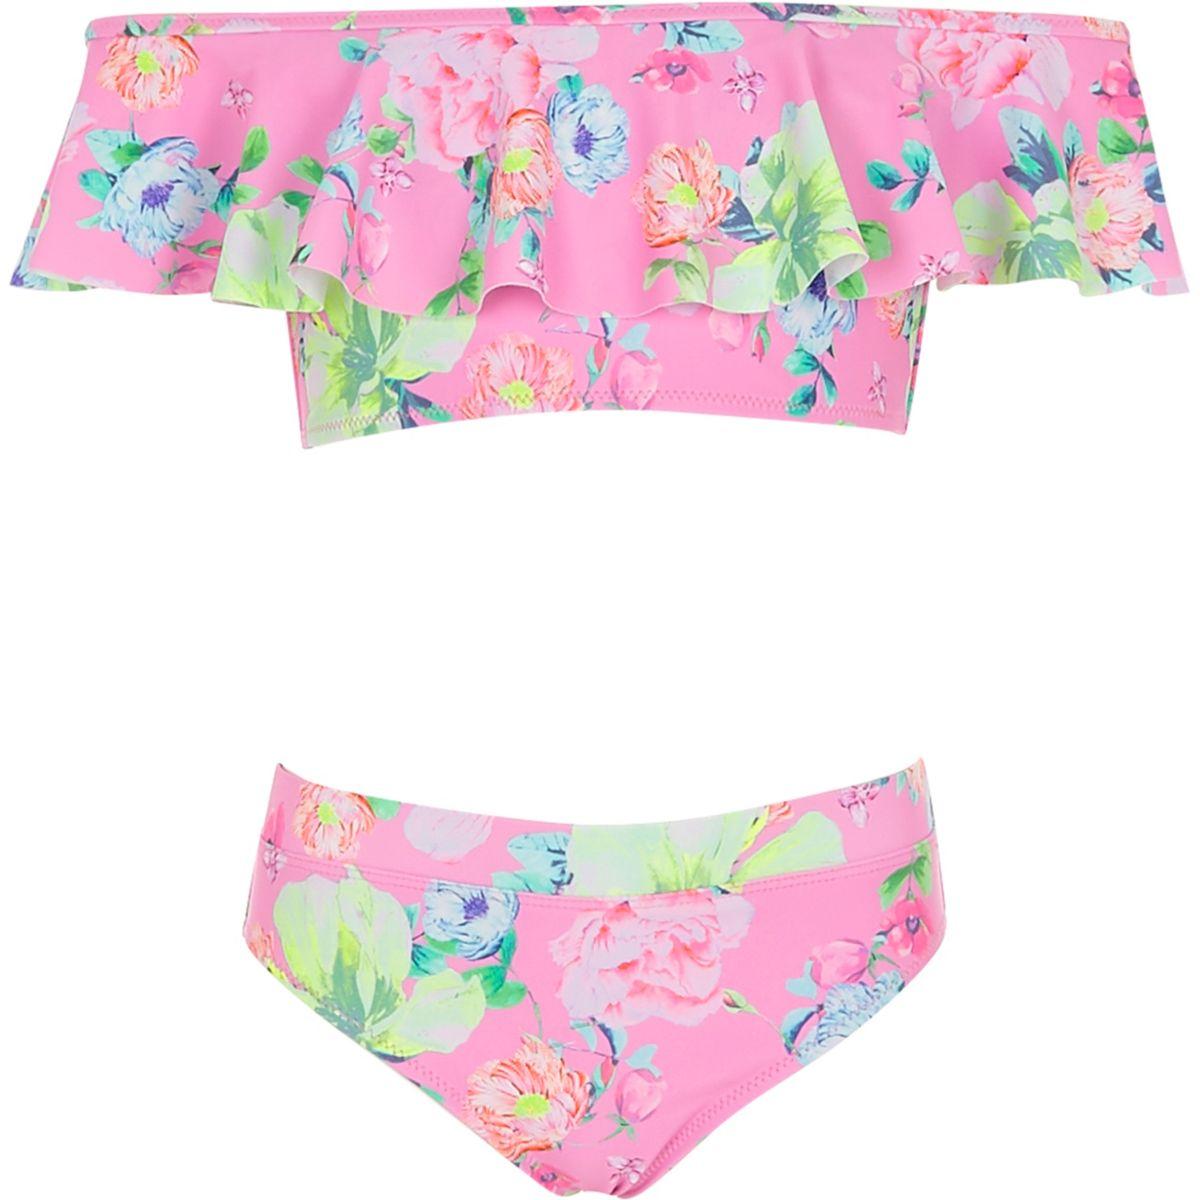 Bikini à fleurs rose avec encolure Bardot à volants pour file